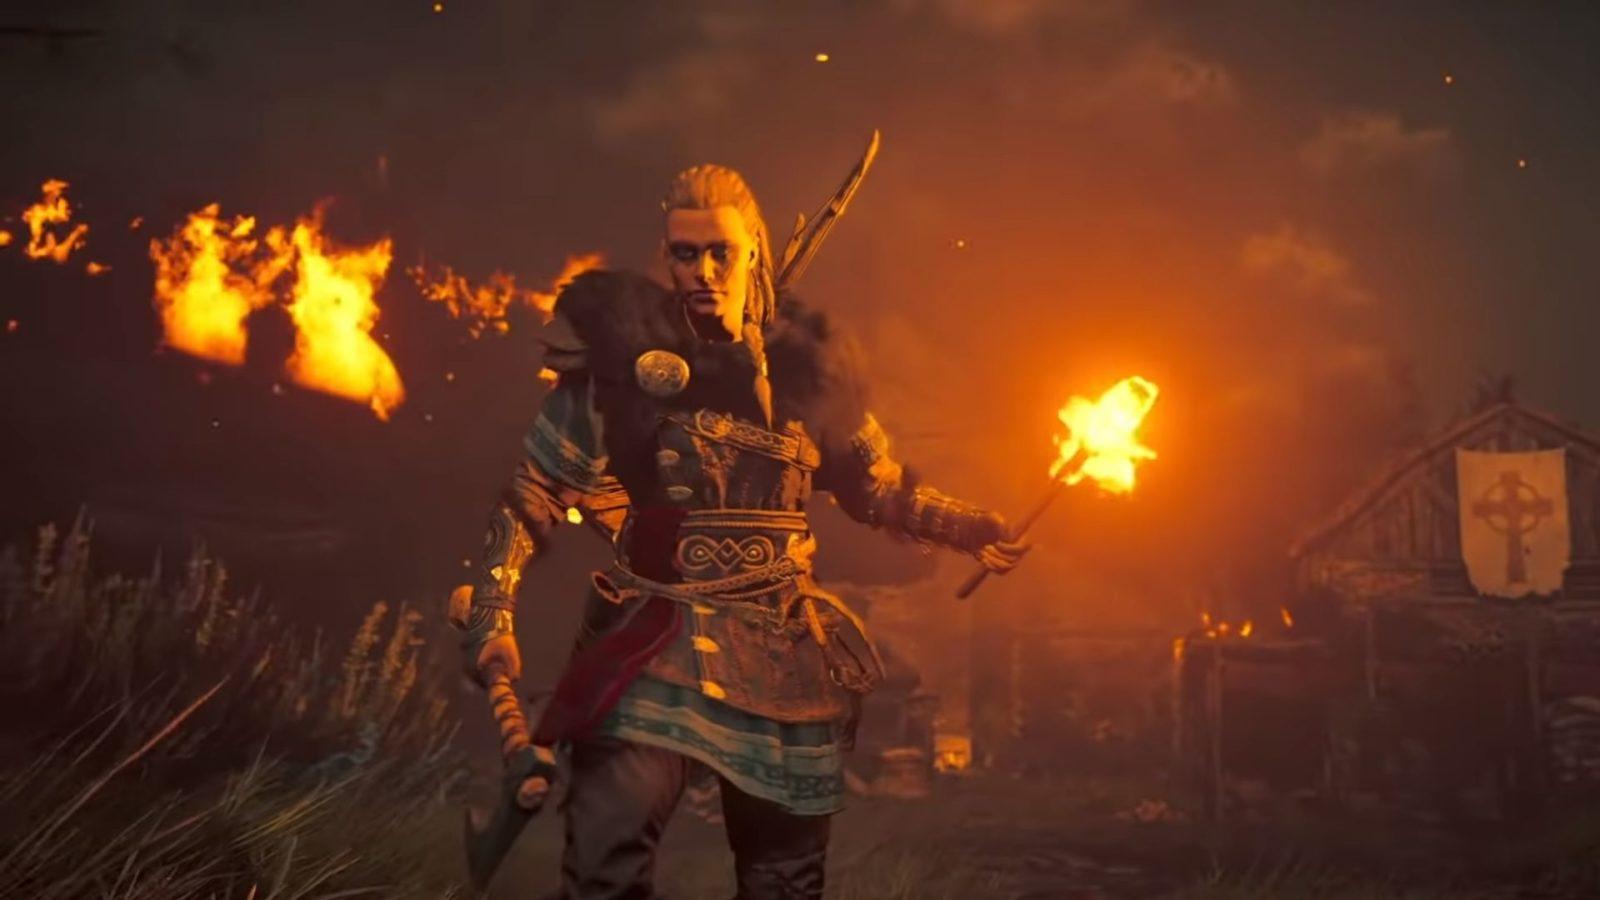 Eivor in a burning village in Assassin's Creed Valhalla